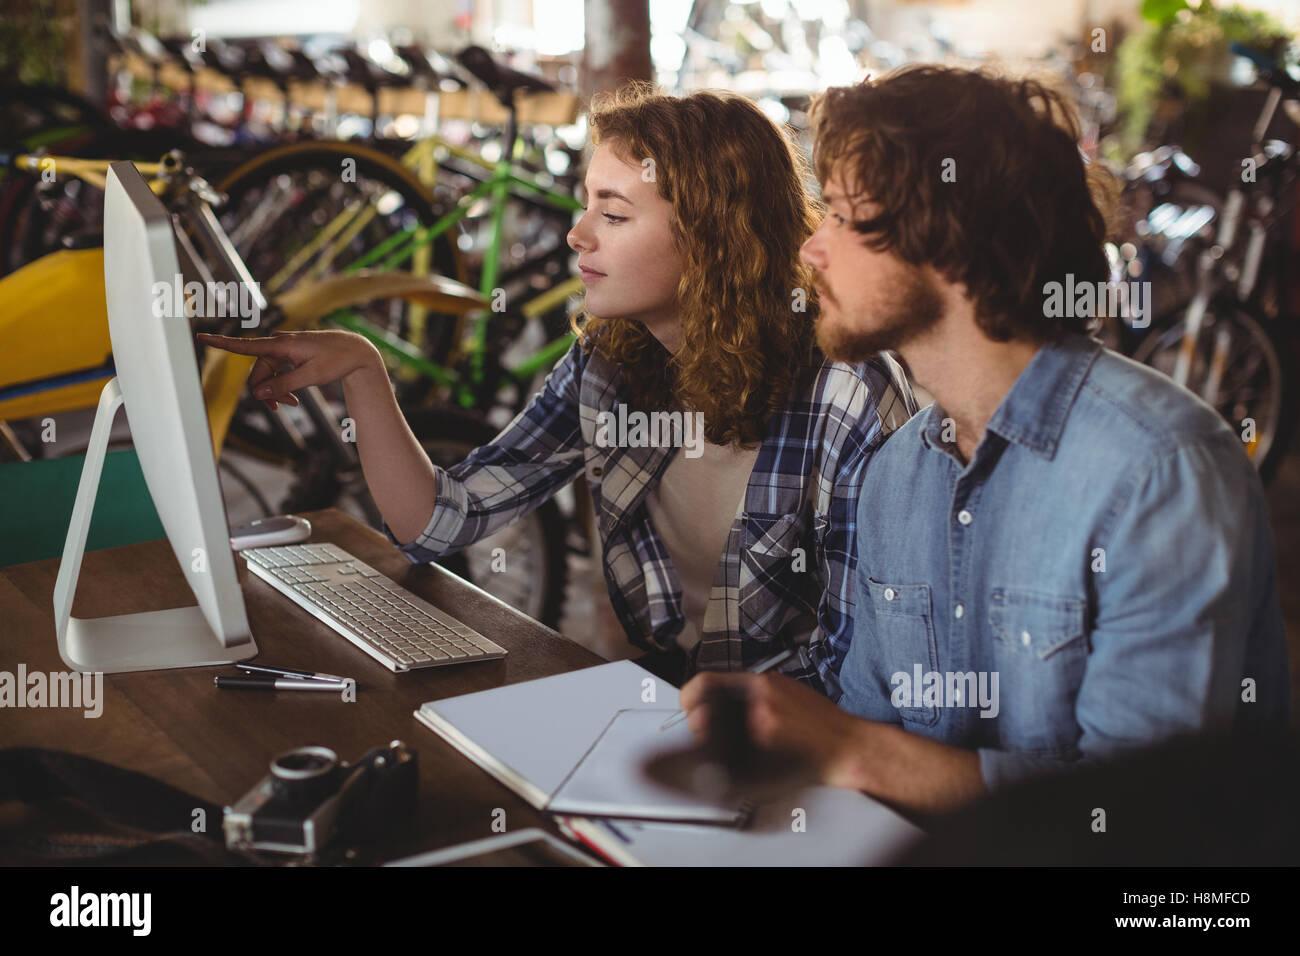 Mechanics working on personal computer - Stock Image